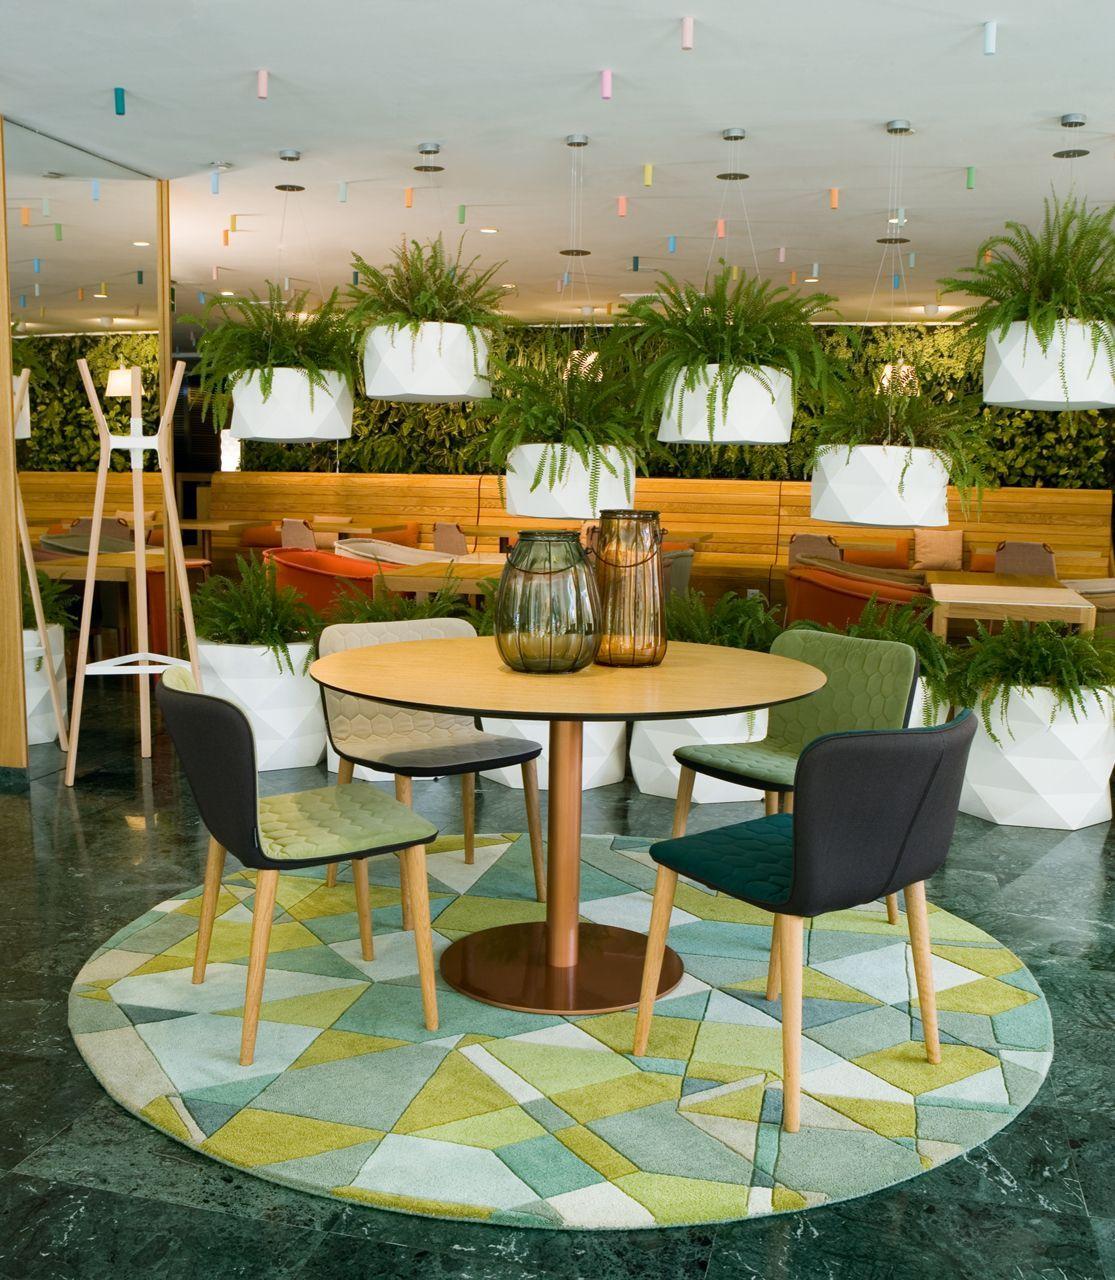 tapis laine tavern vert rond 230 cm toulemonde bochart. Black Bedroom Furniture Sets. Home Design Ideas